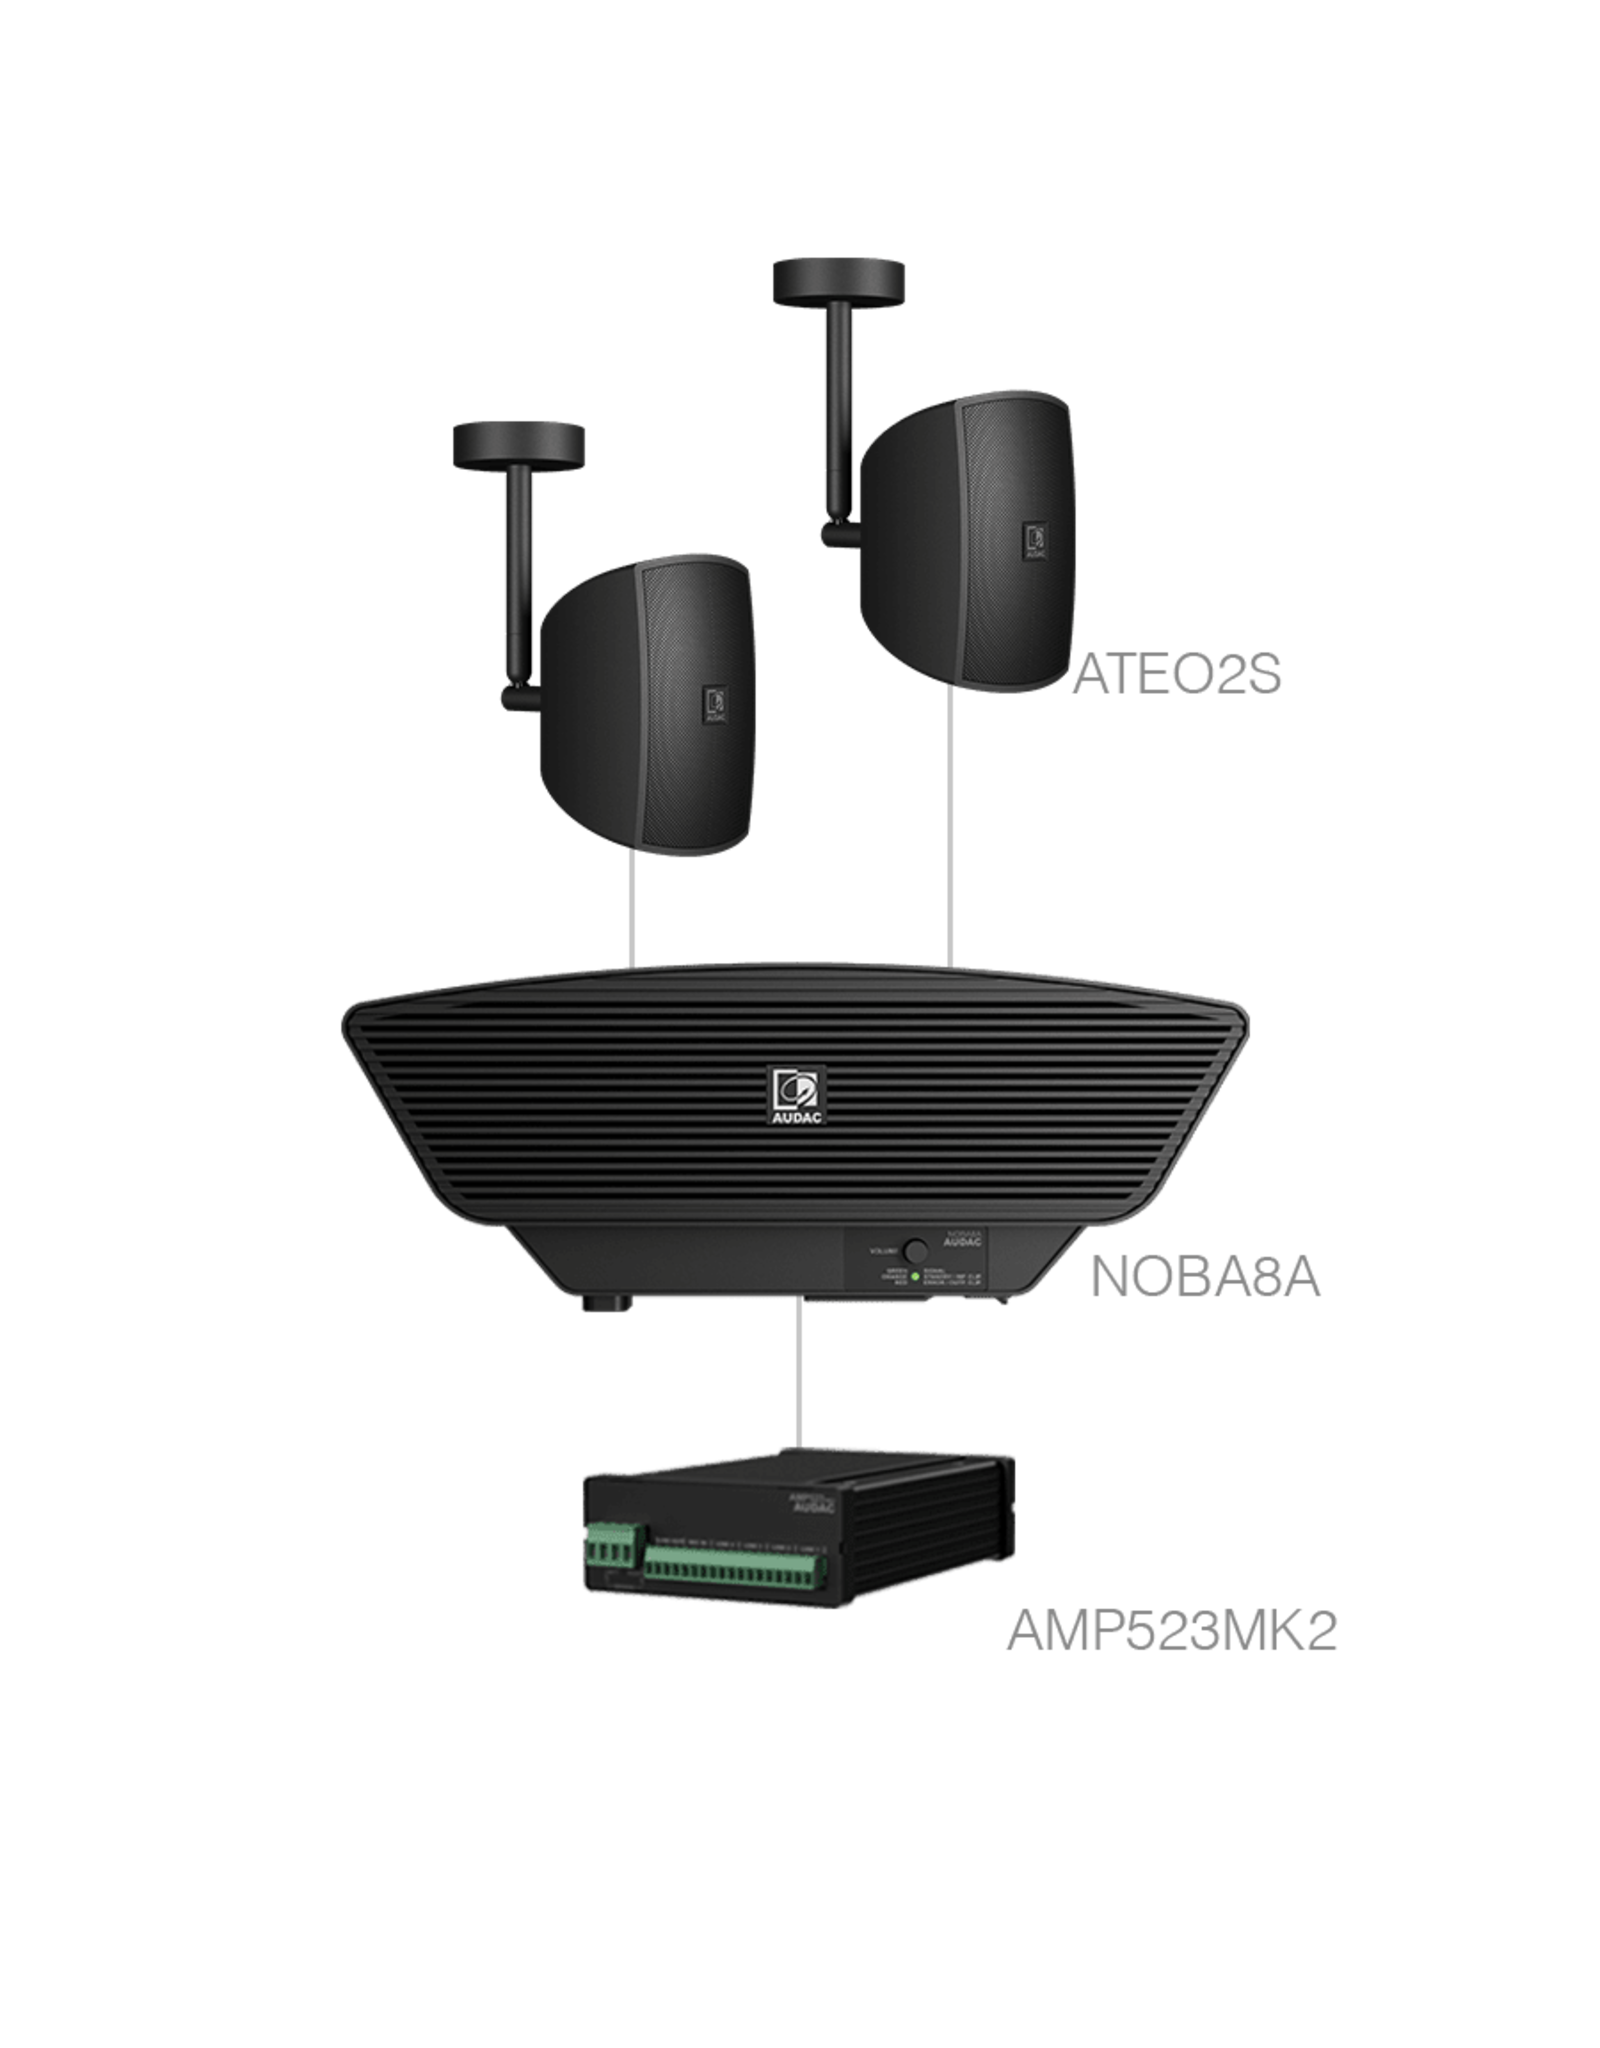 Audac 2x ATEO2S + NOBA8A + AMP523MK2 Black